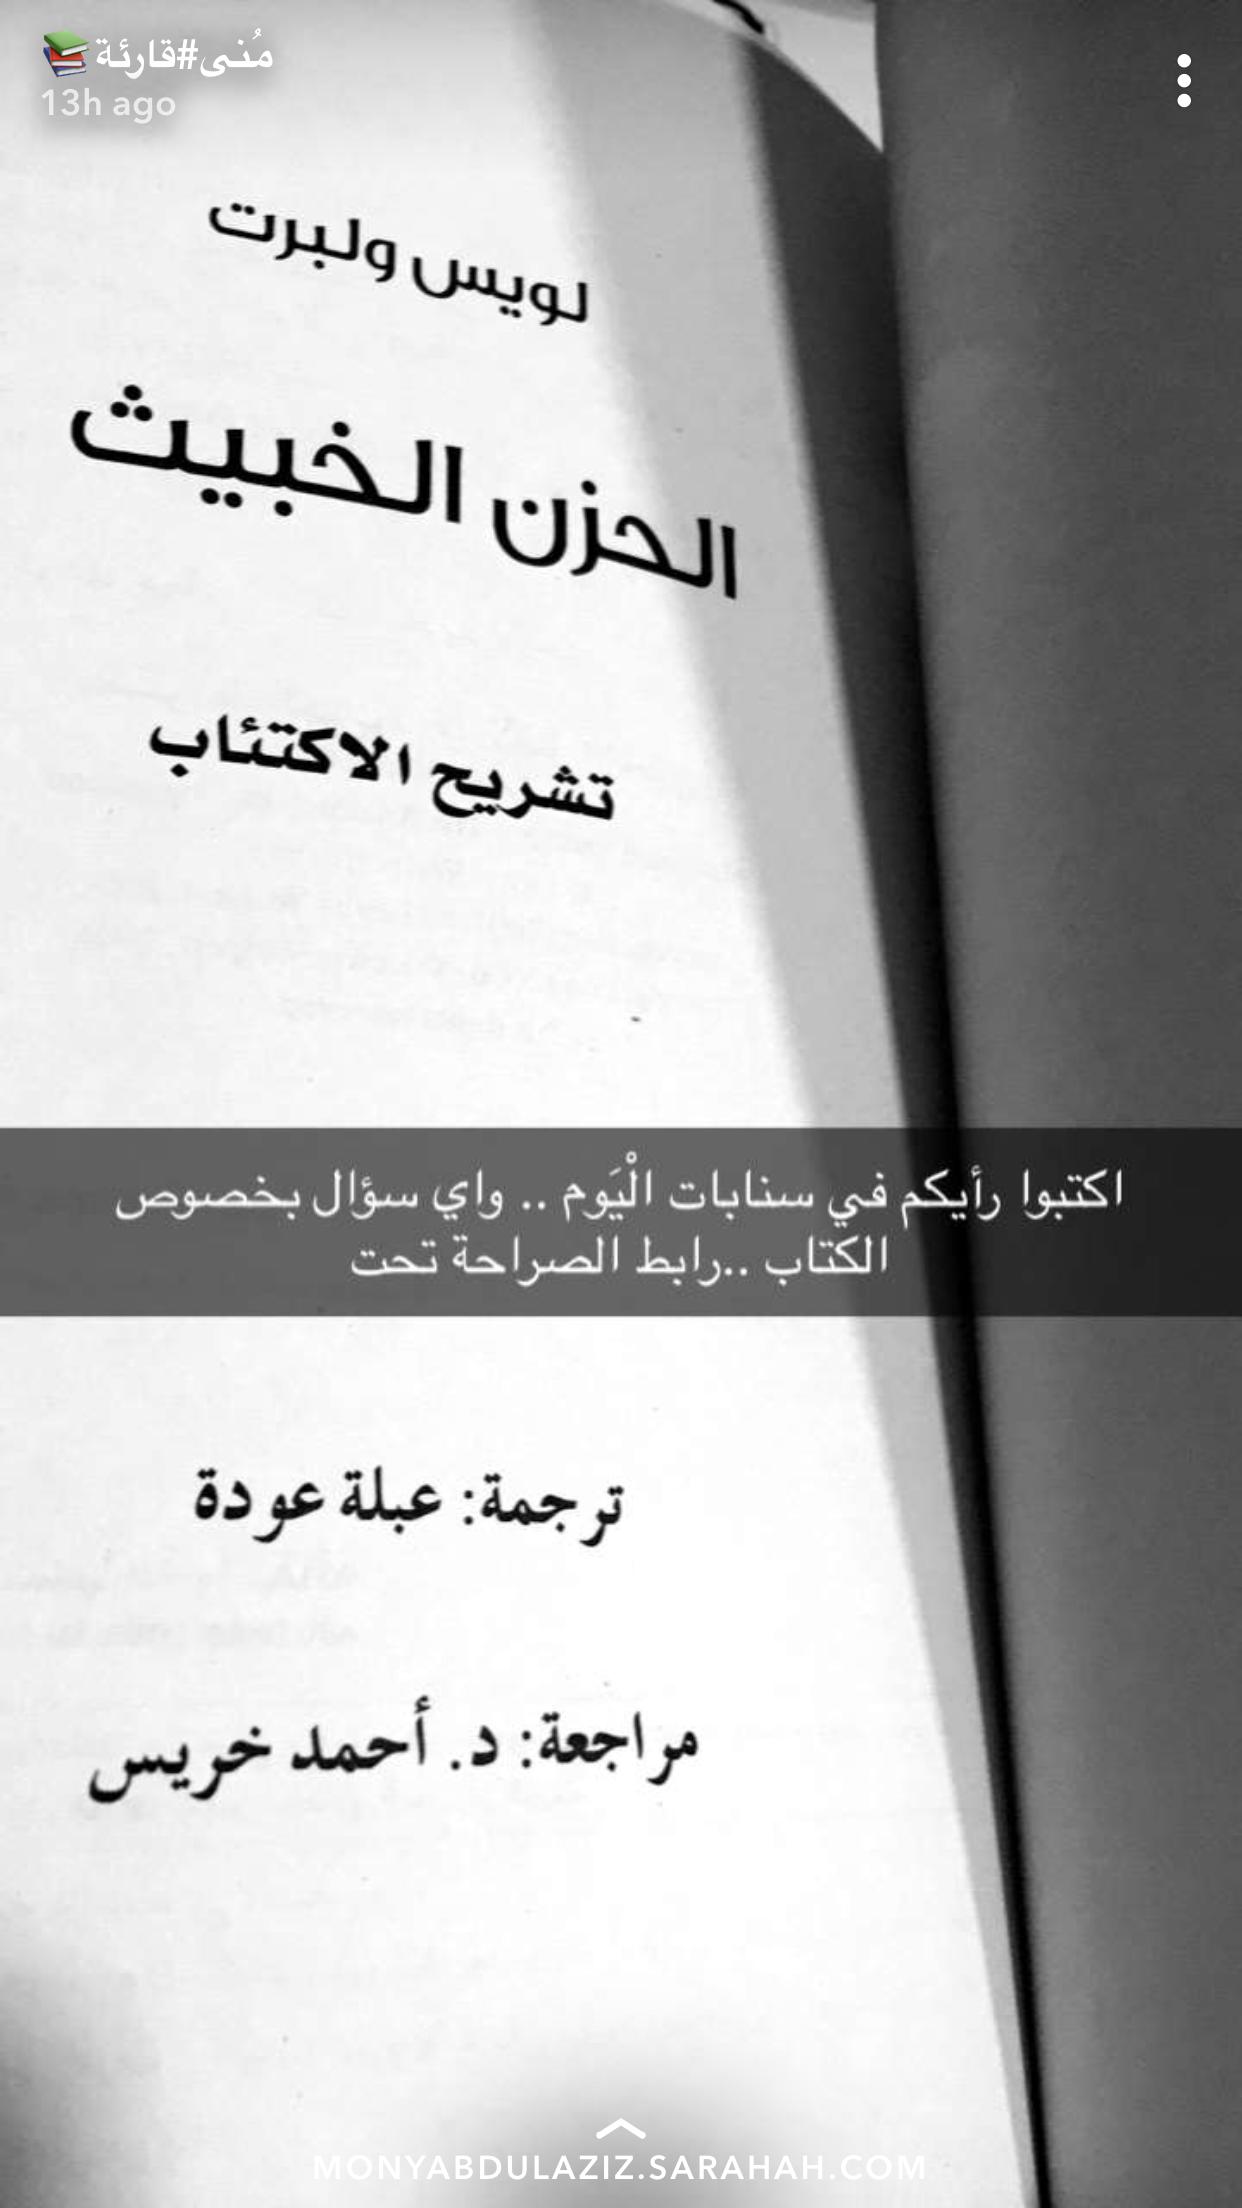 Pin By Malak On Books ك تب Book Club Books Ebooks Free Books Pdf Books Reading